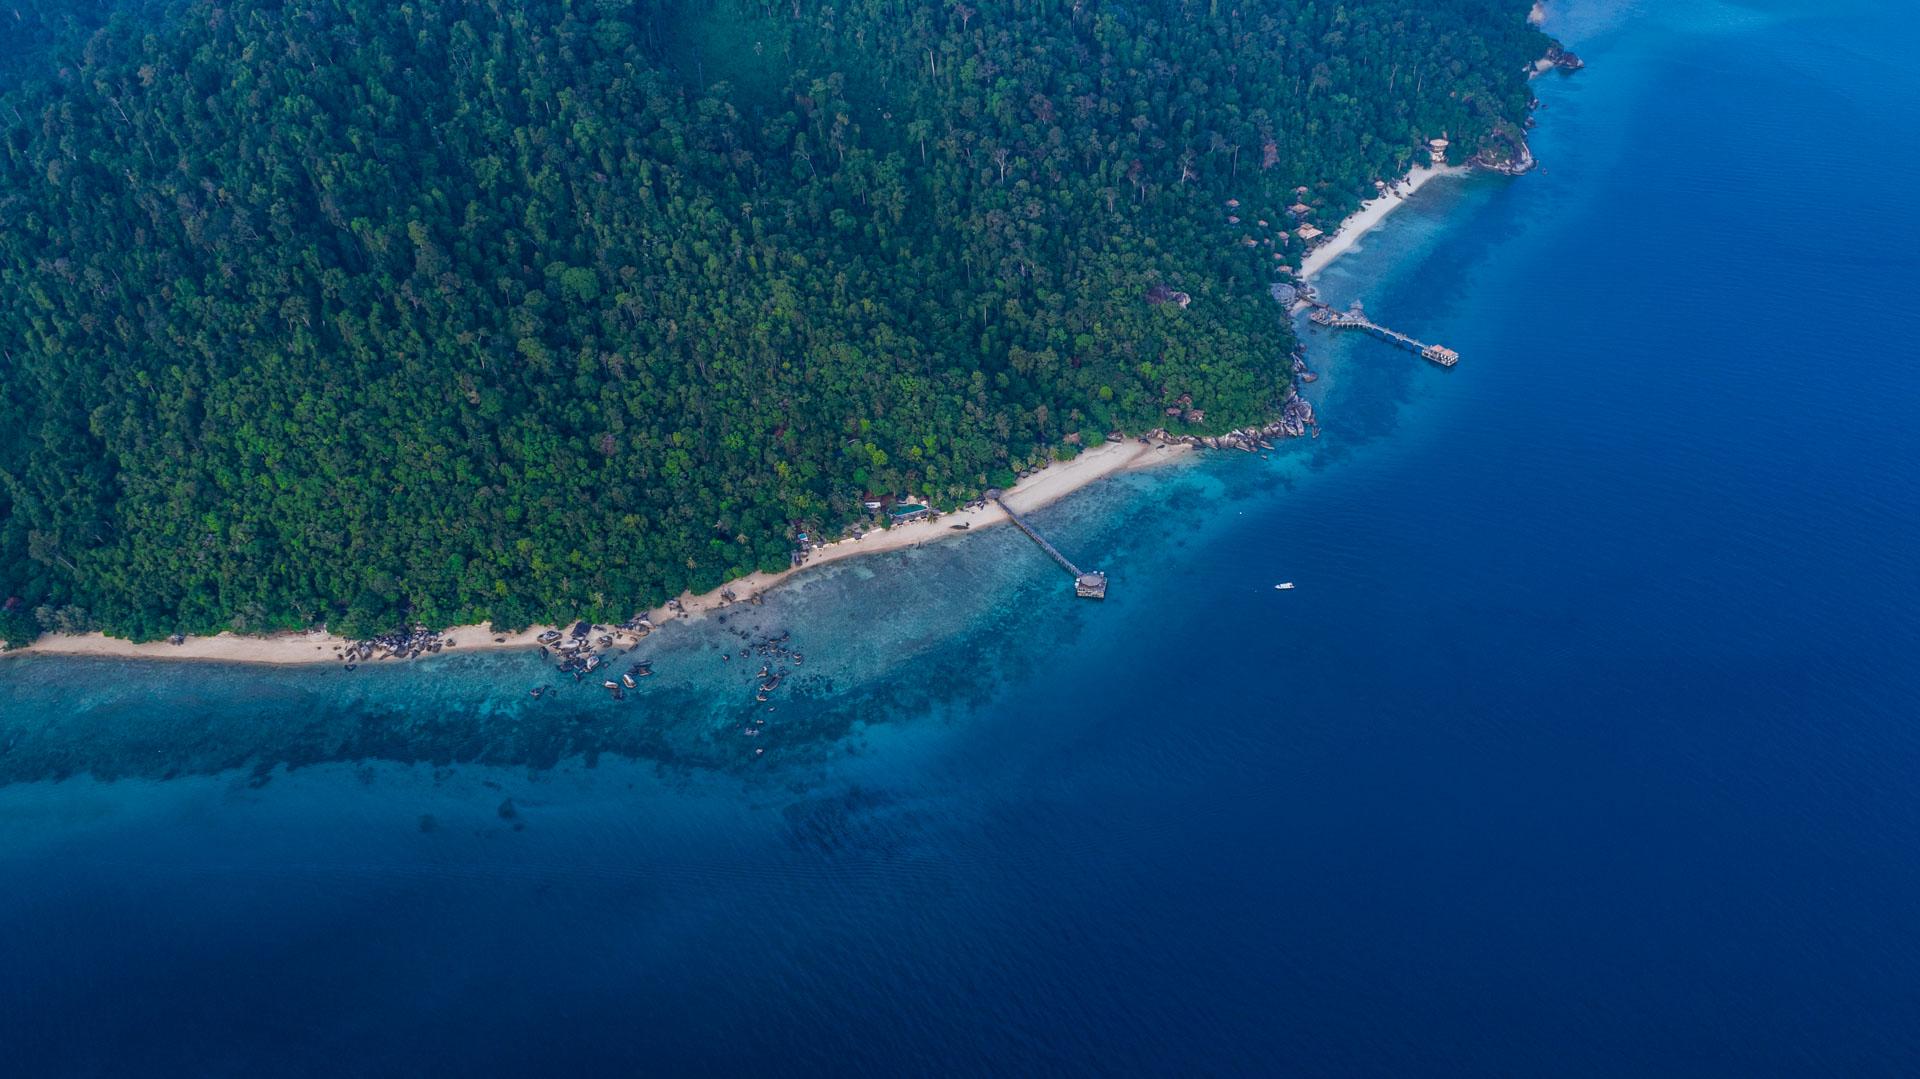 Tioman Island Malaysia Pescart Travel Photo Blog Enrico Pescantini aerial view drone 1